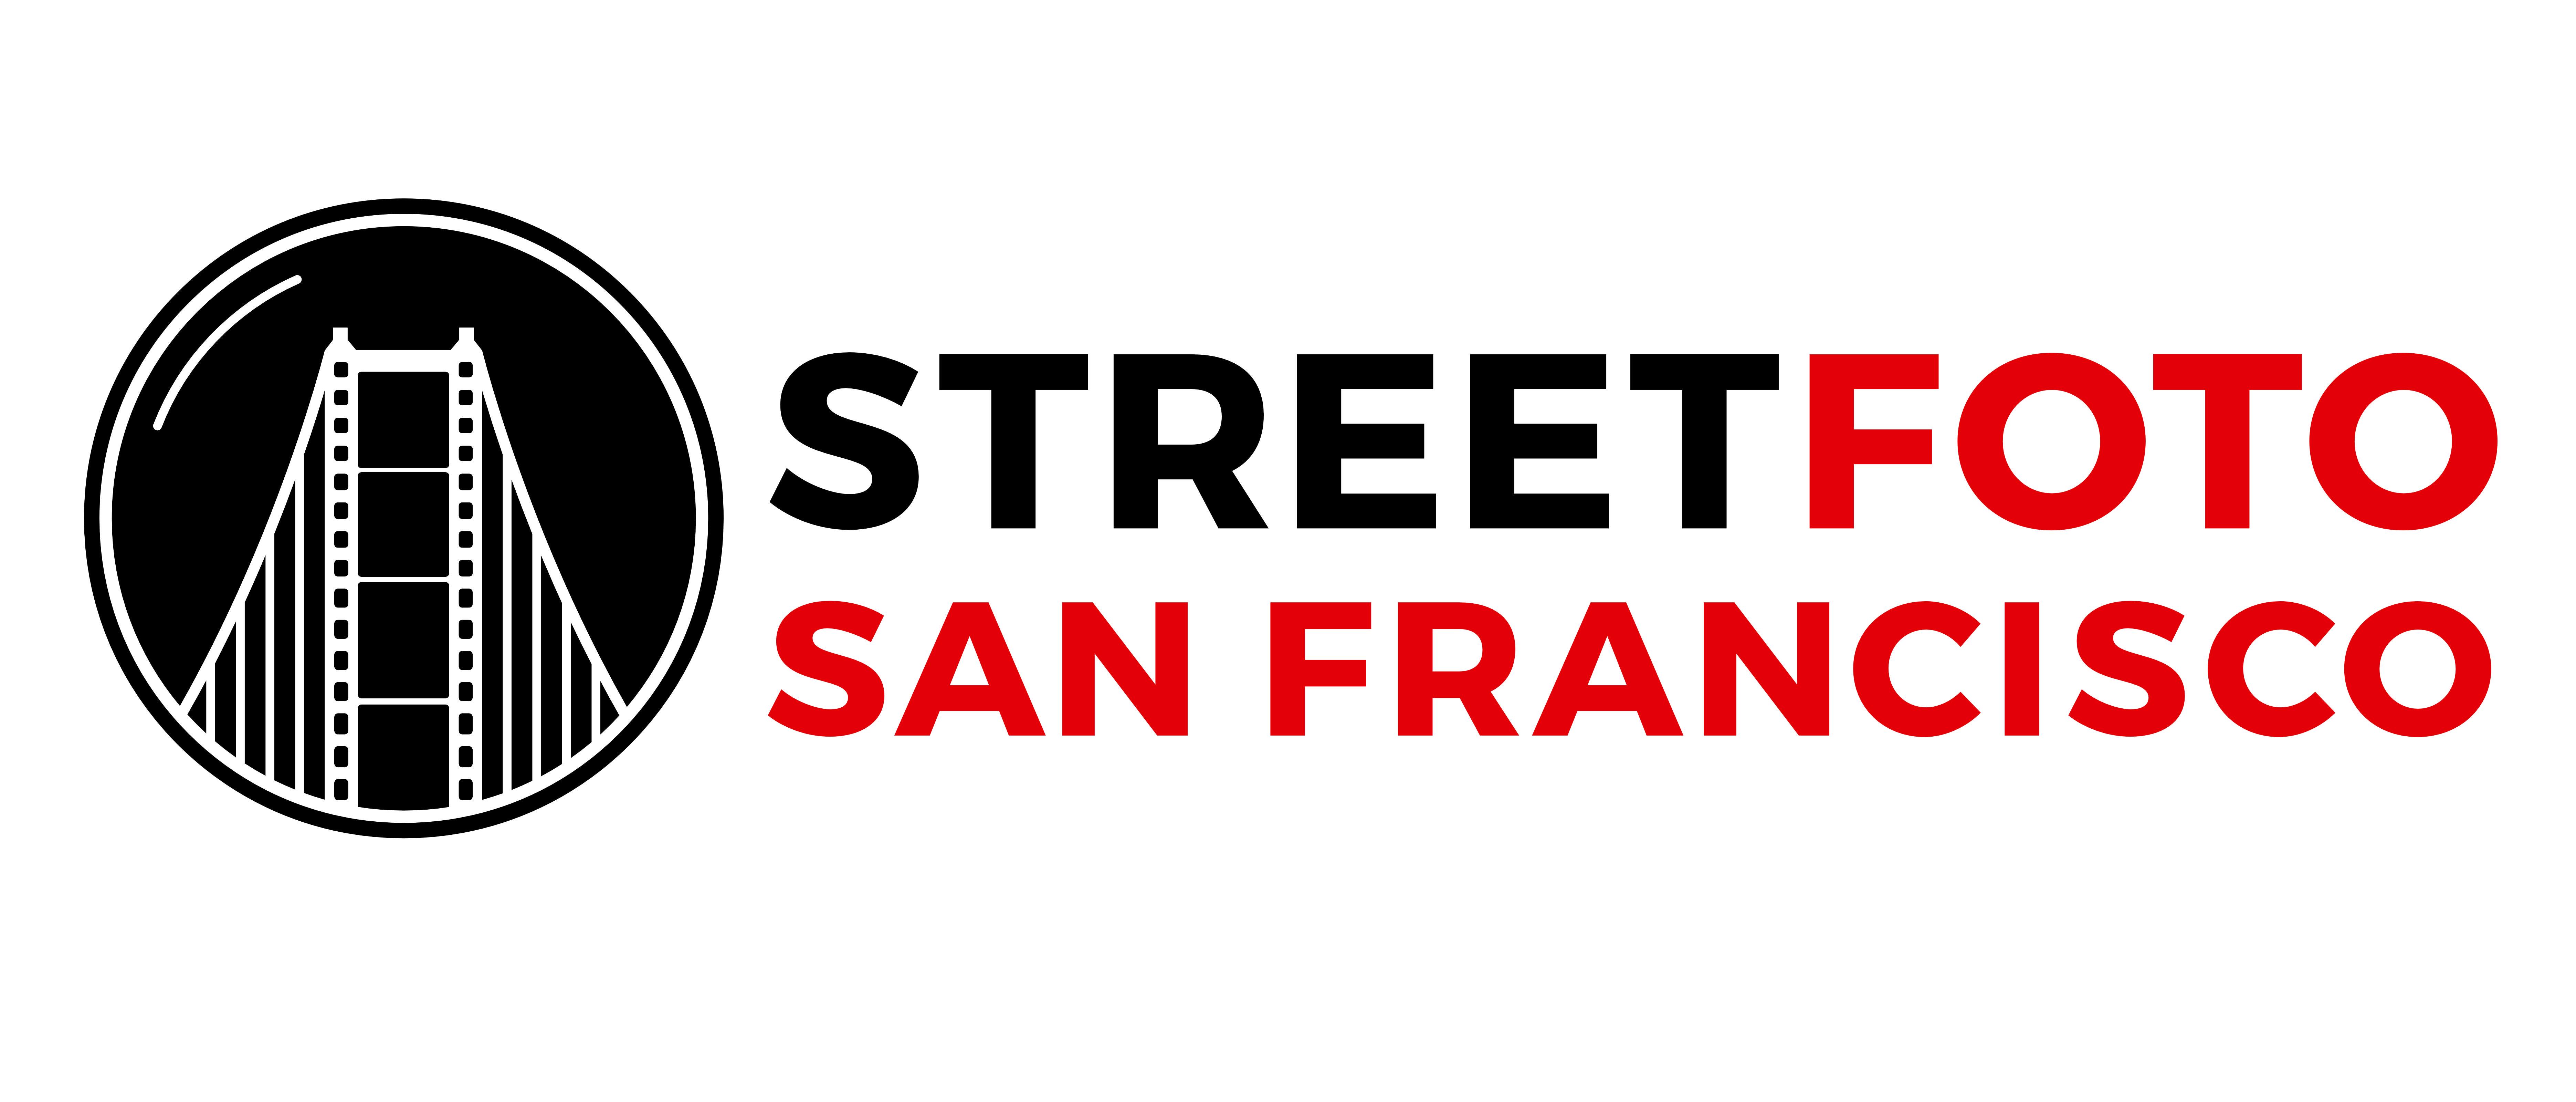 StreetFoto San Francisco International Street Photography Awards - logo